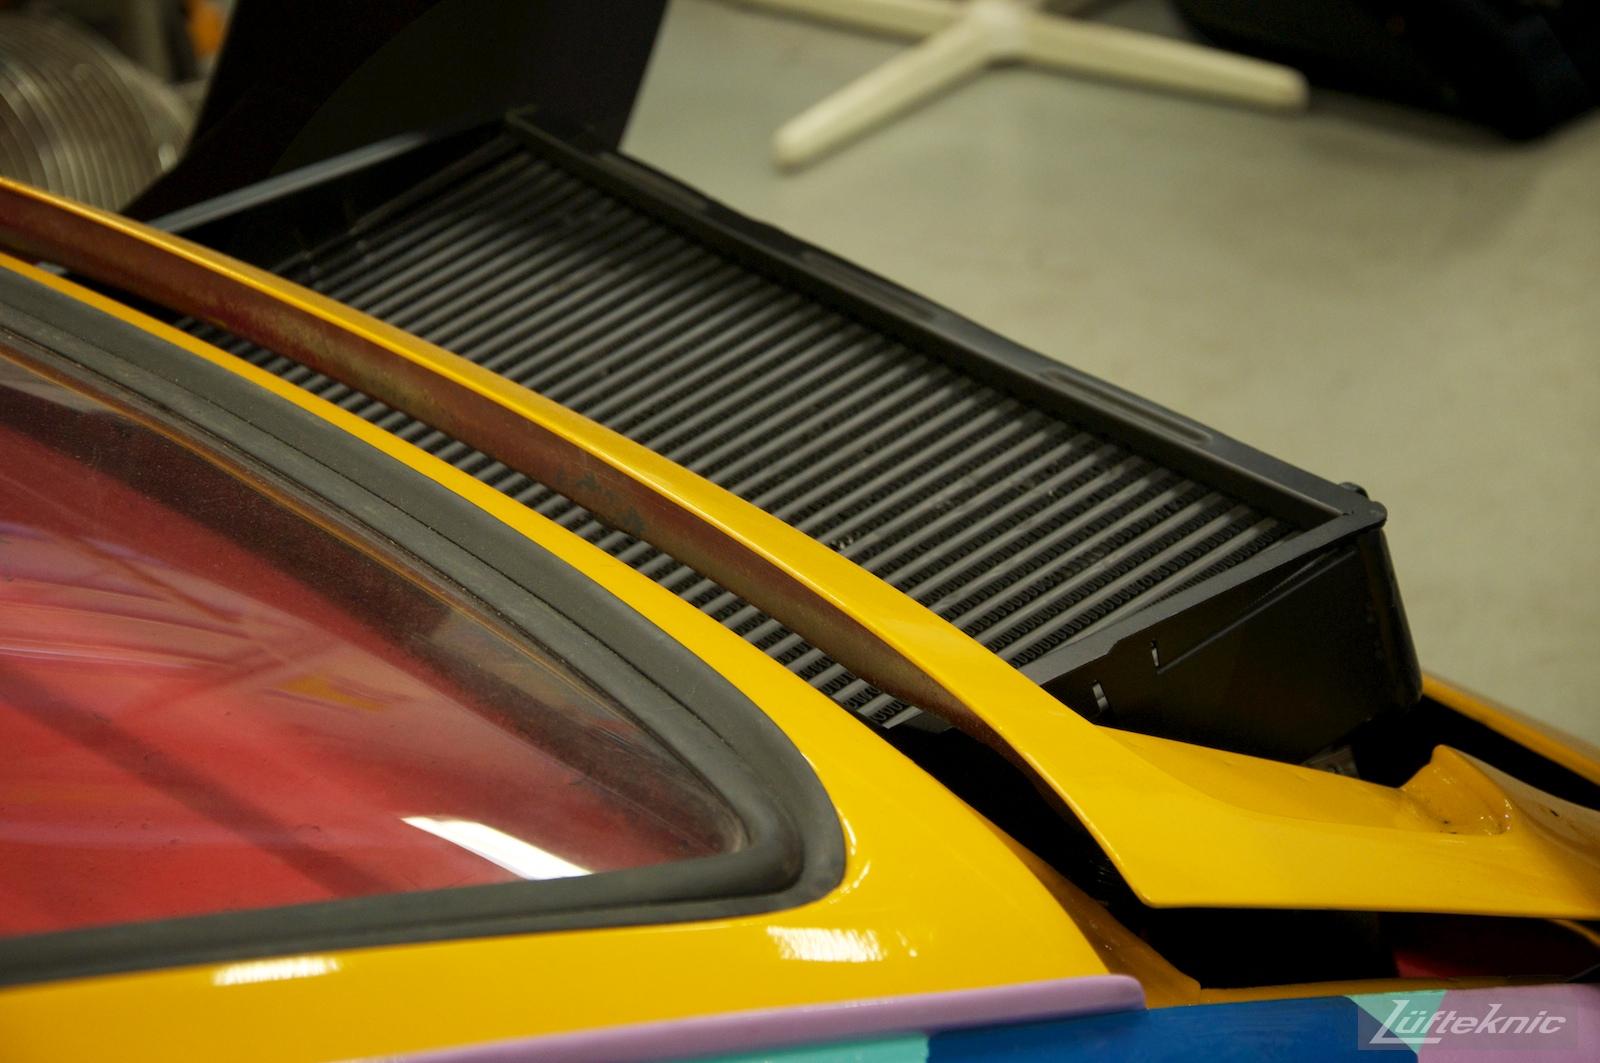 Engine intercooler peeking through the rear decklid on the Lüfteknic #projectstuka Porsche 930 Turbo